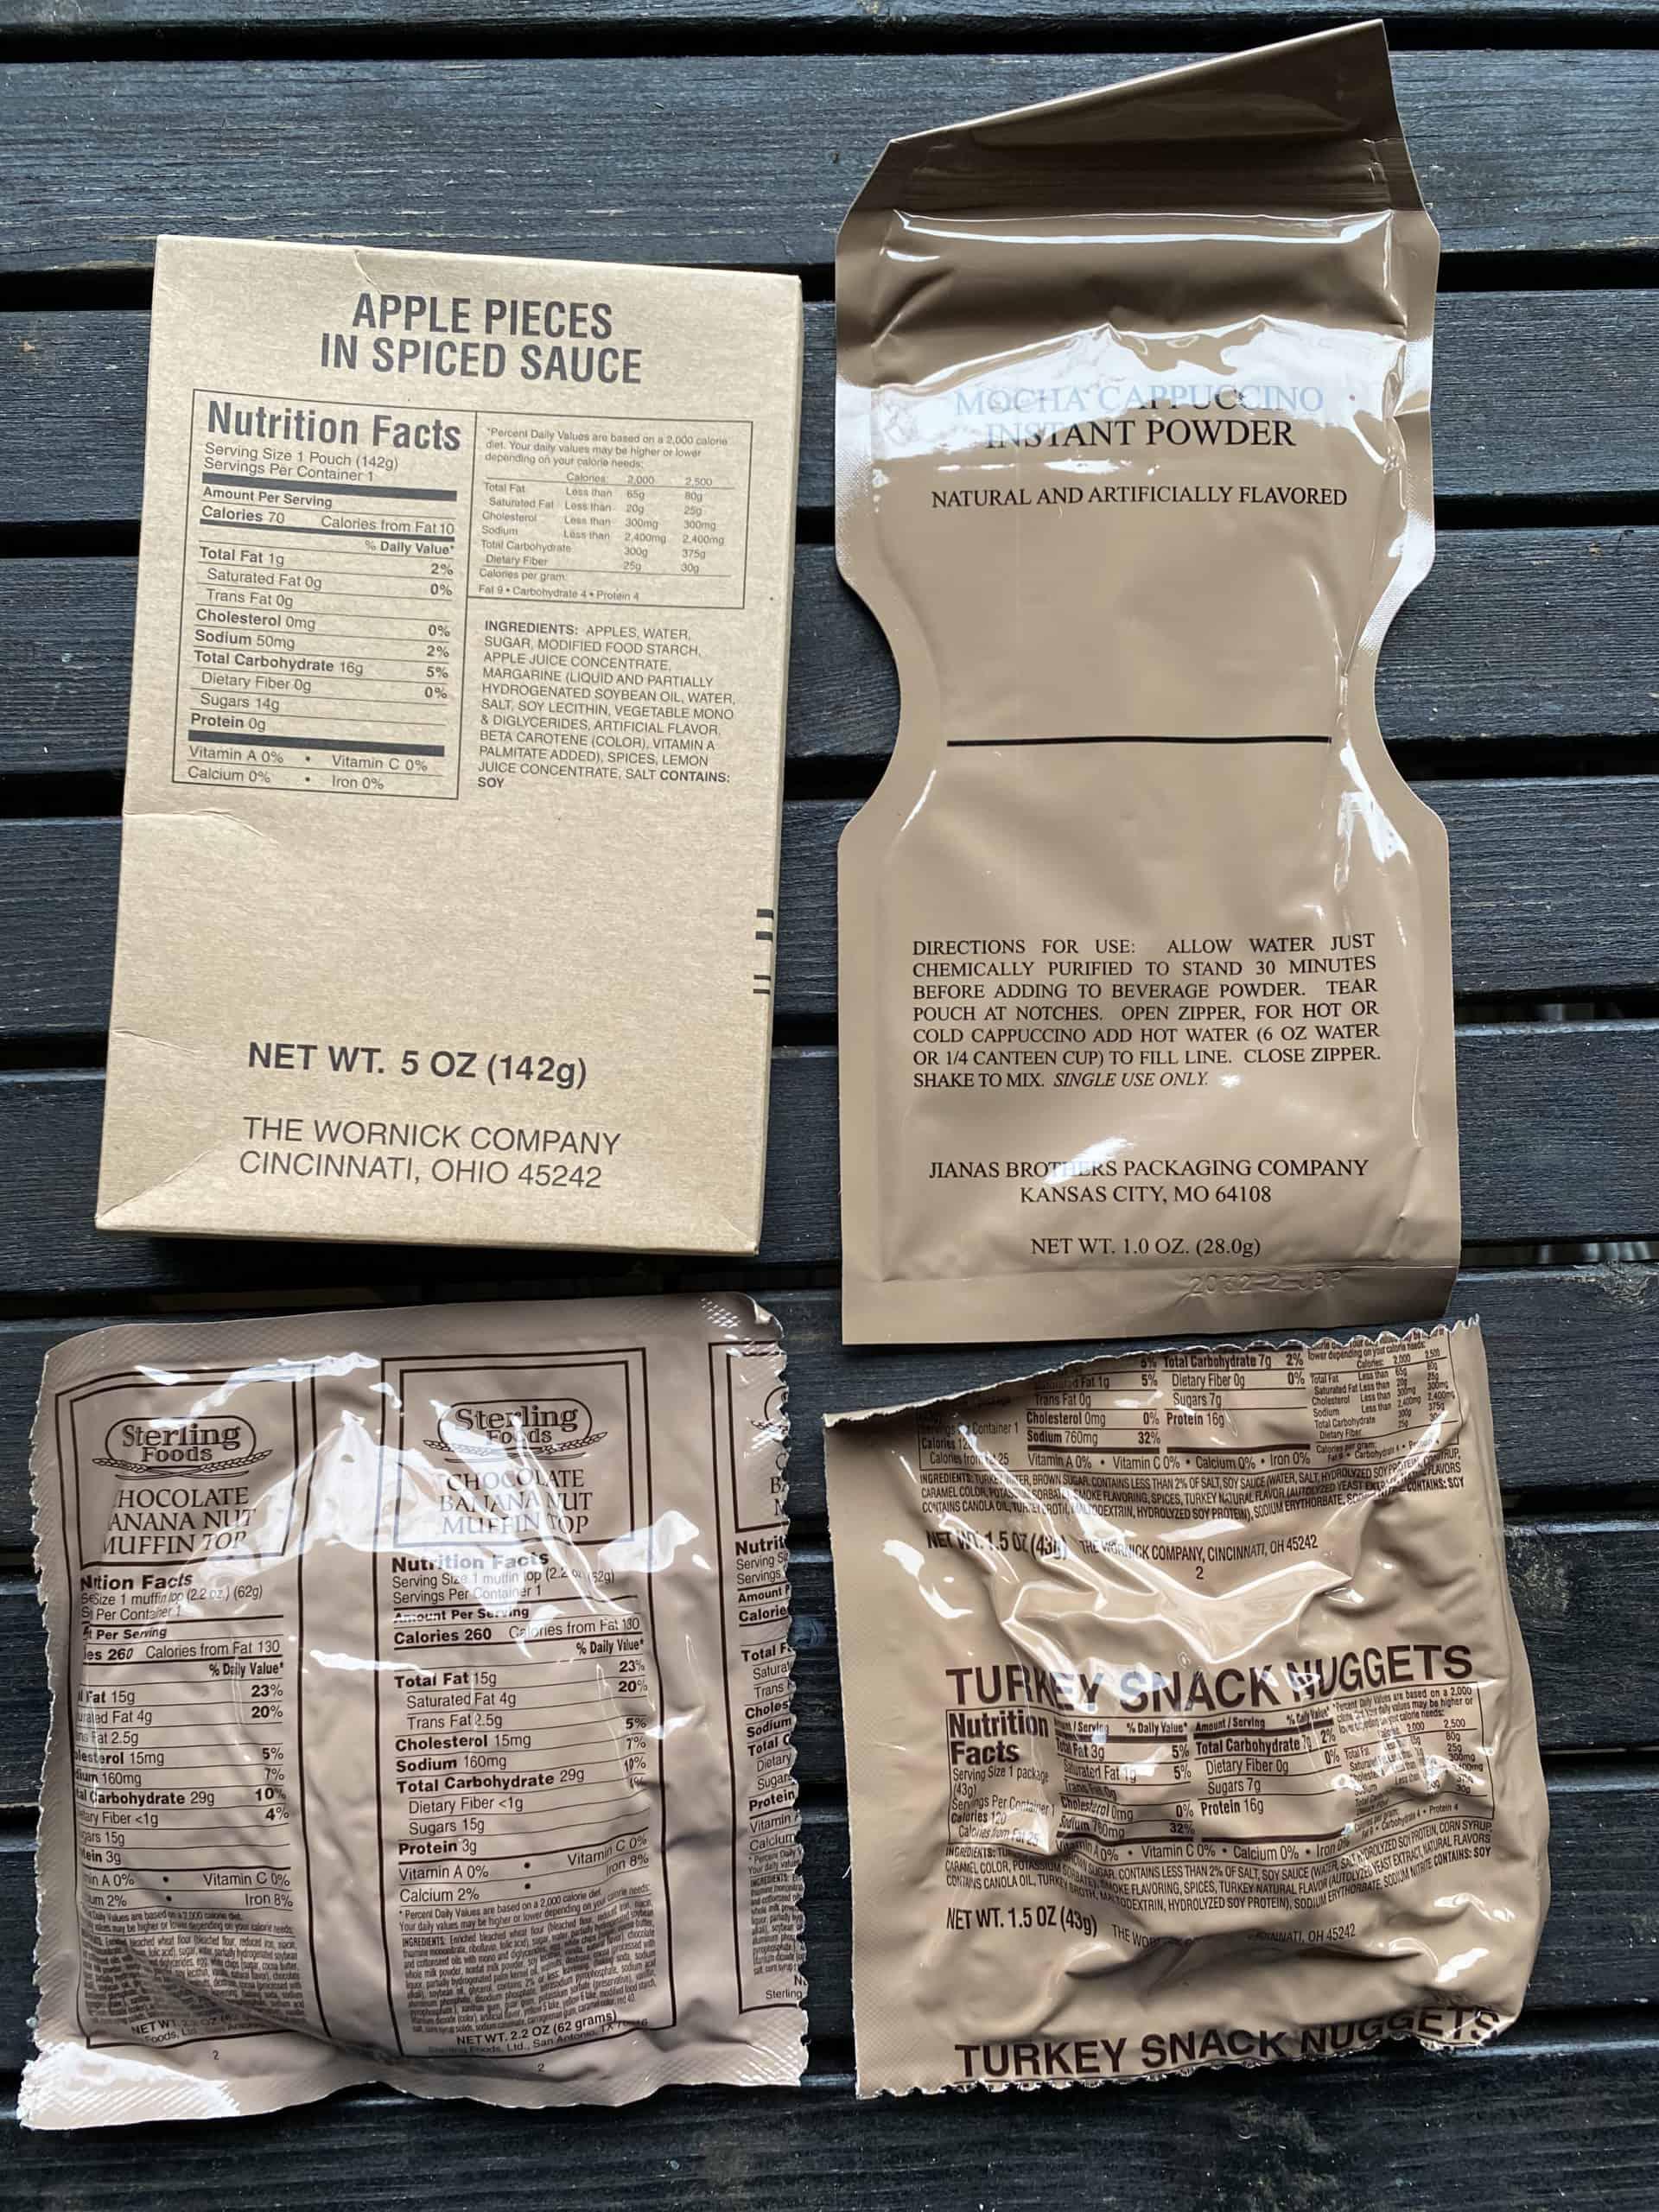 MRE snacks and dessert in tan packaging